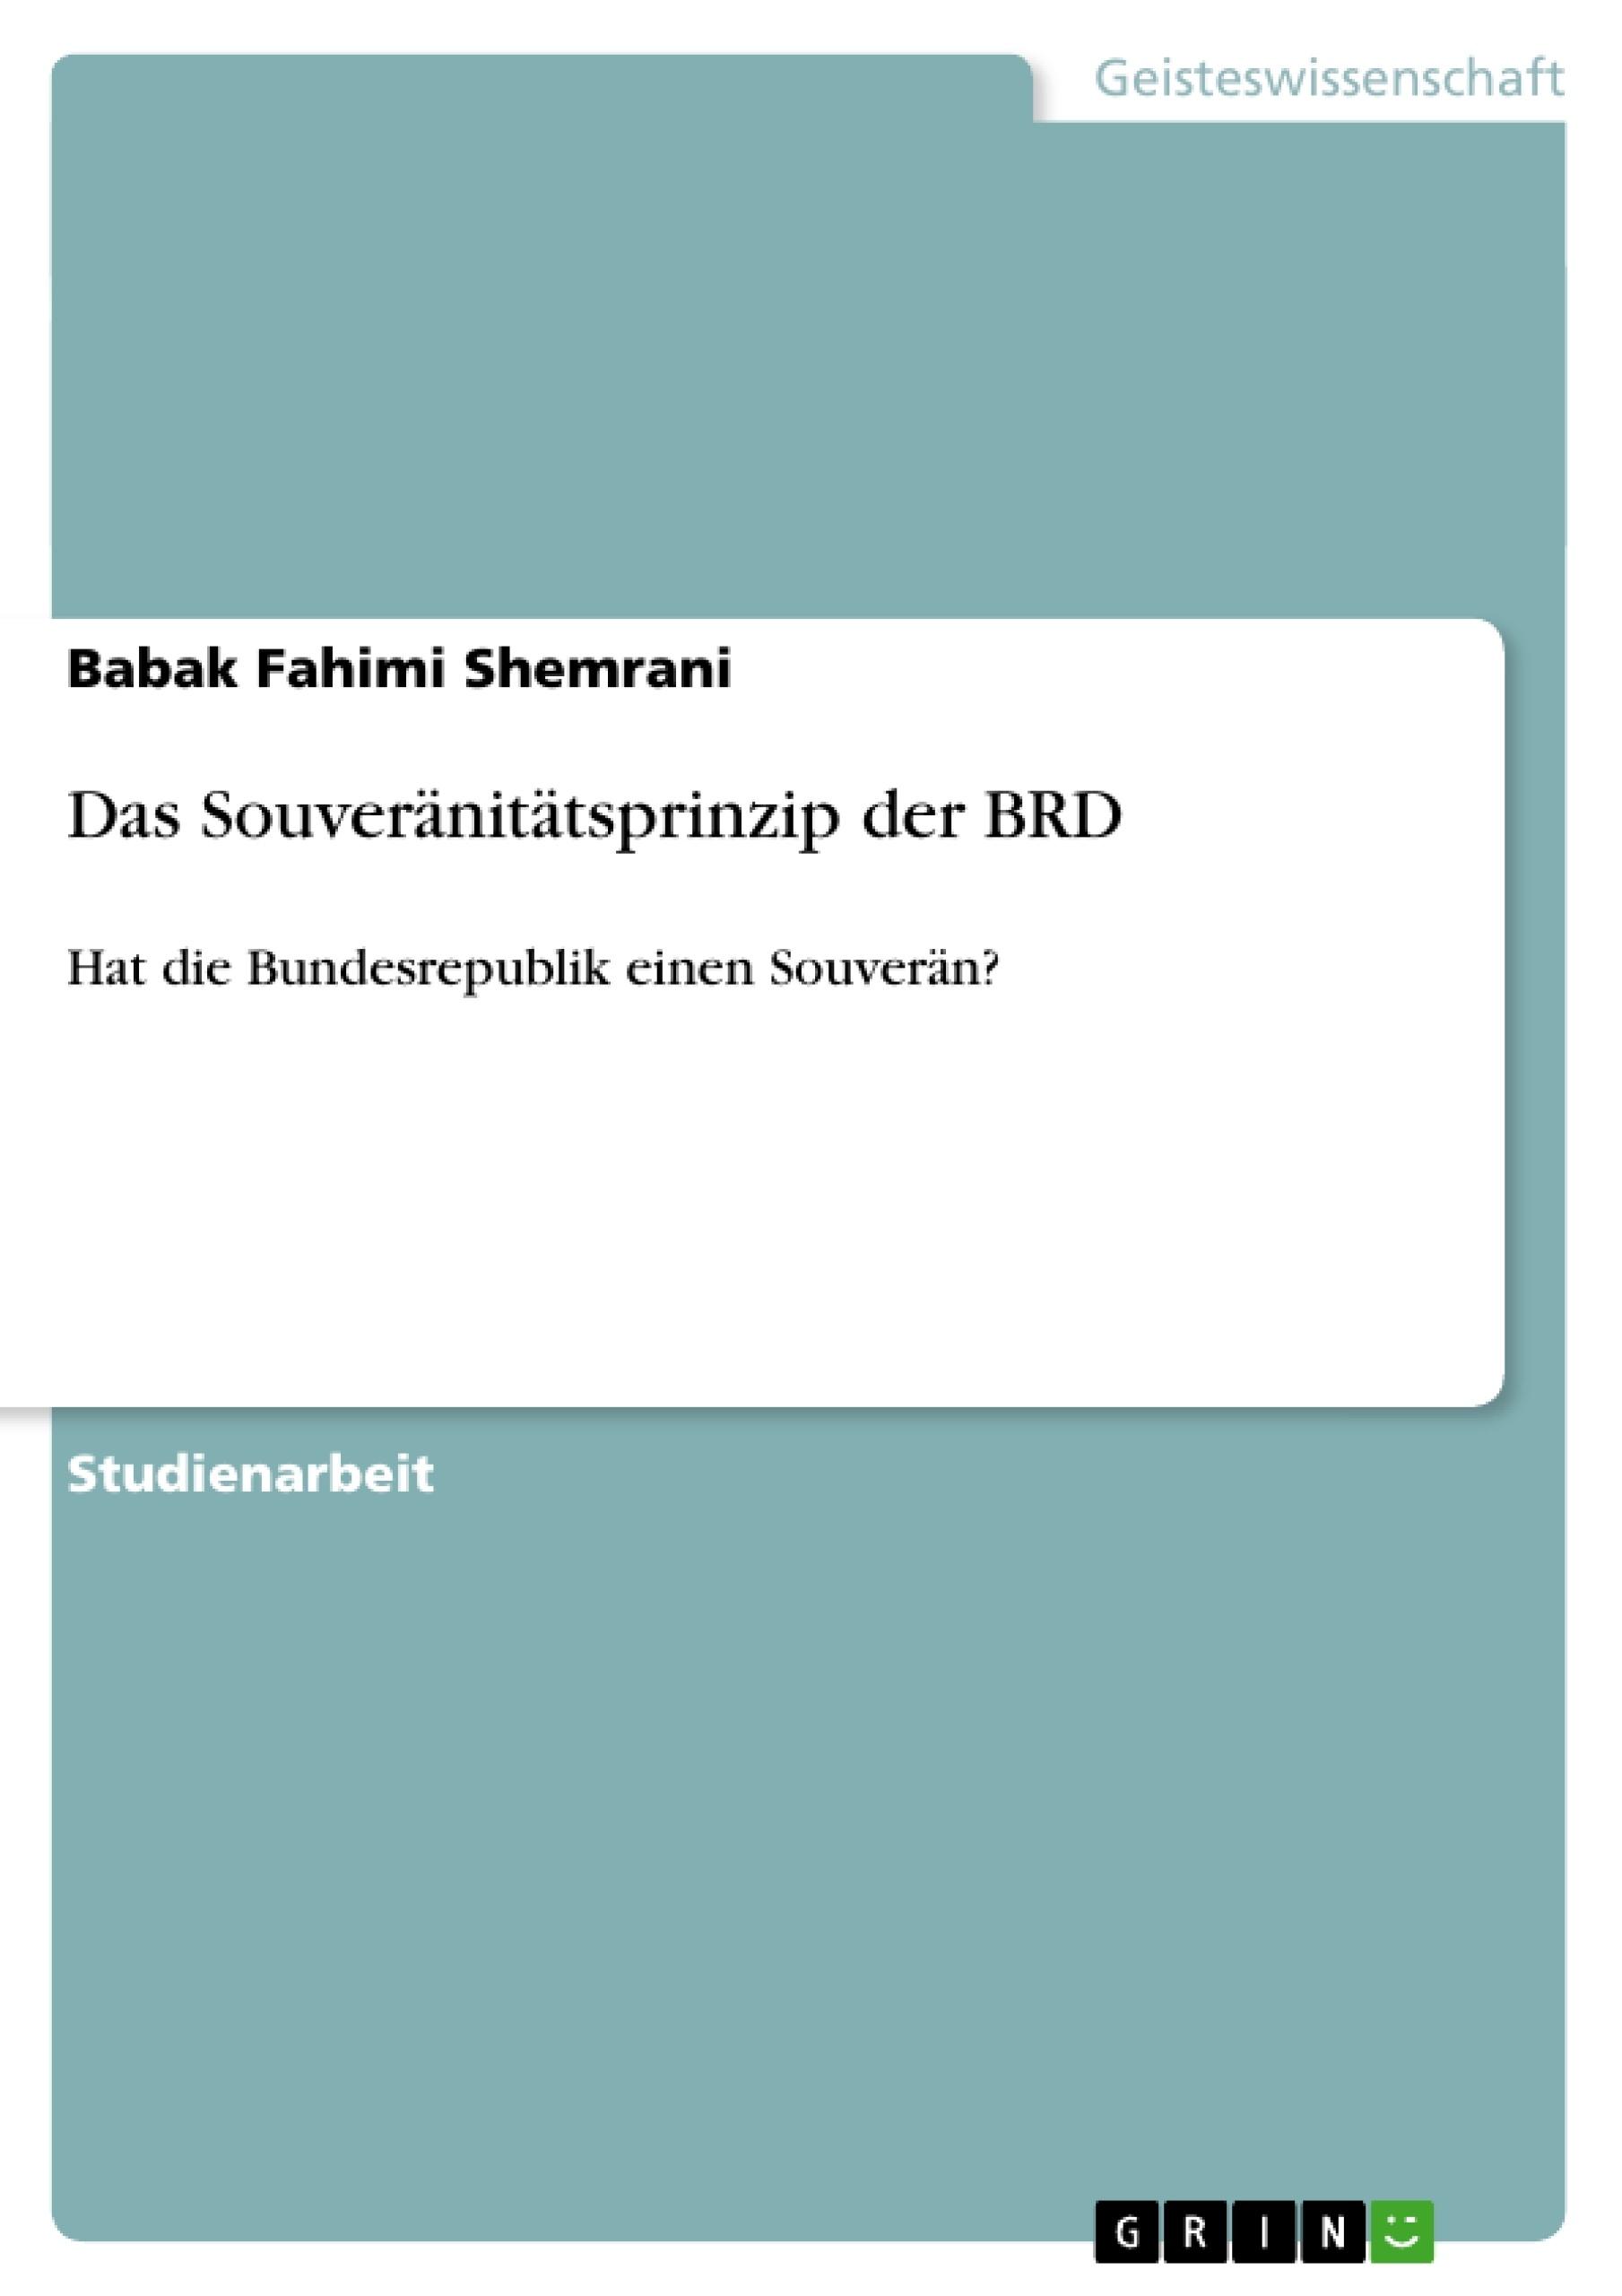 Titel: Das Souveränitätsprinzip der BRD